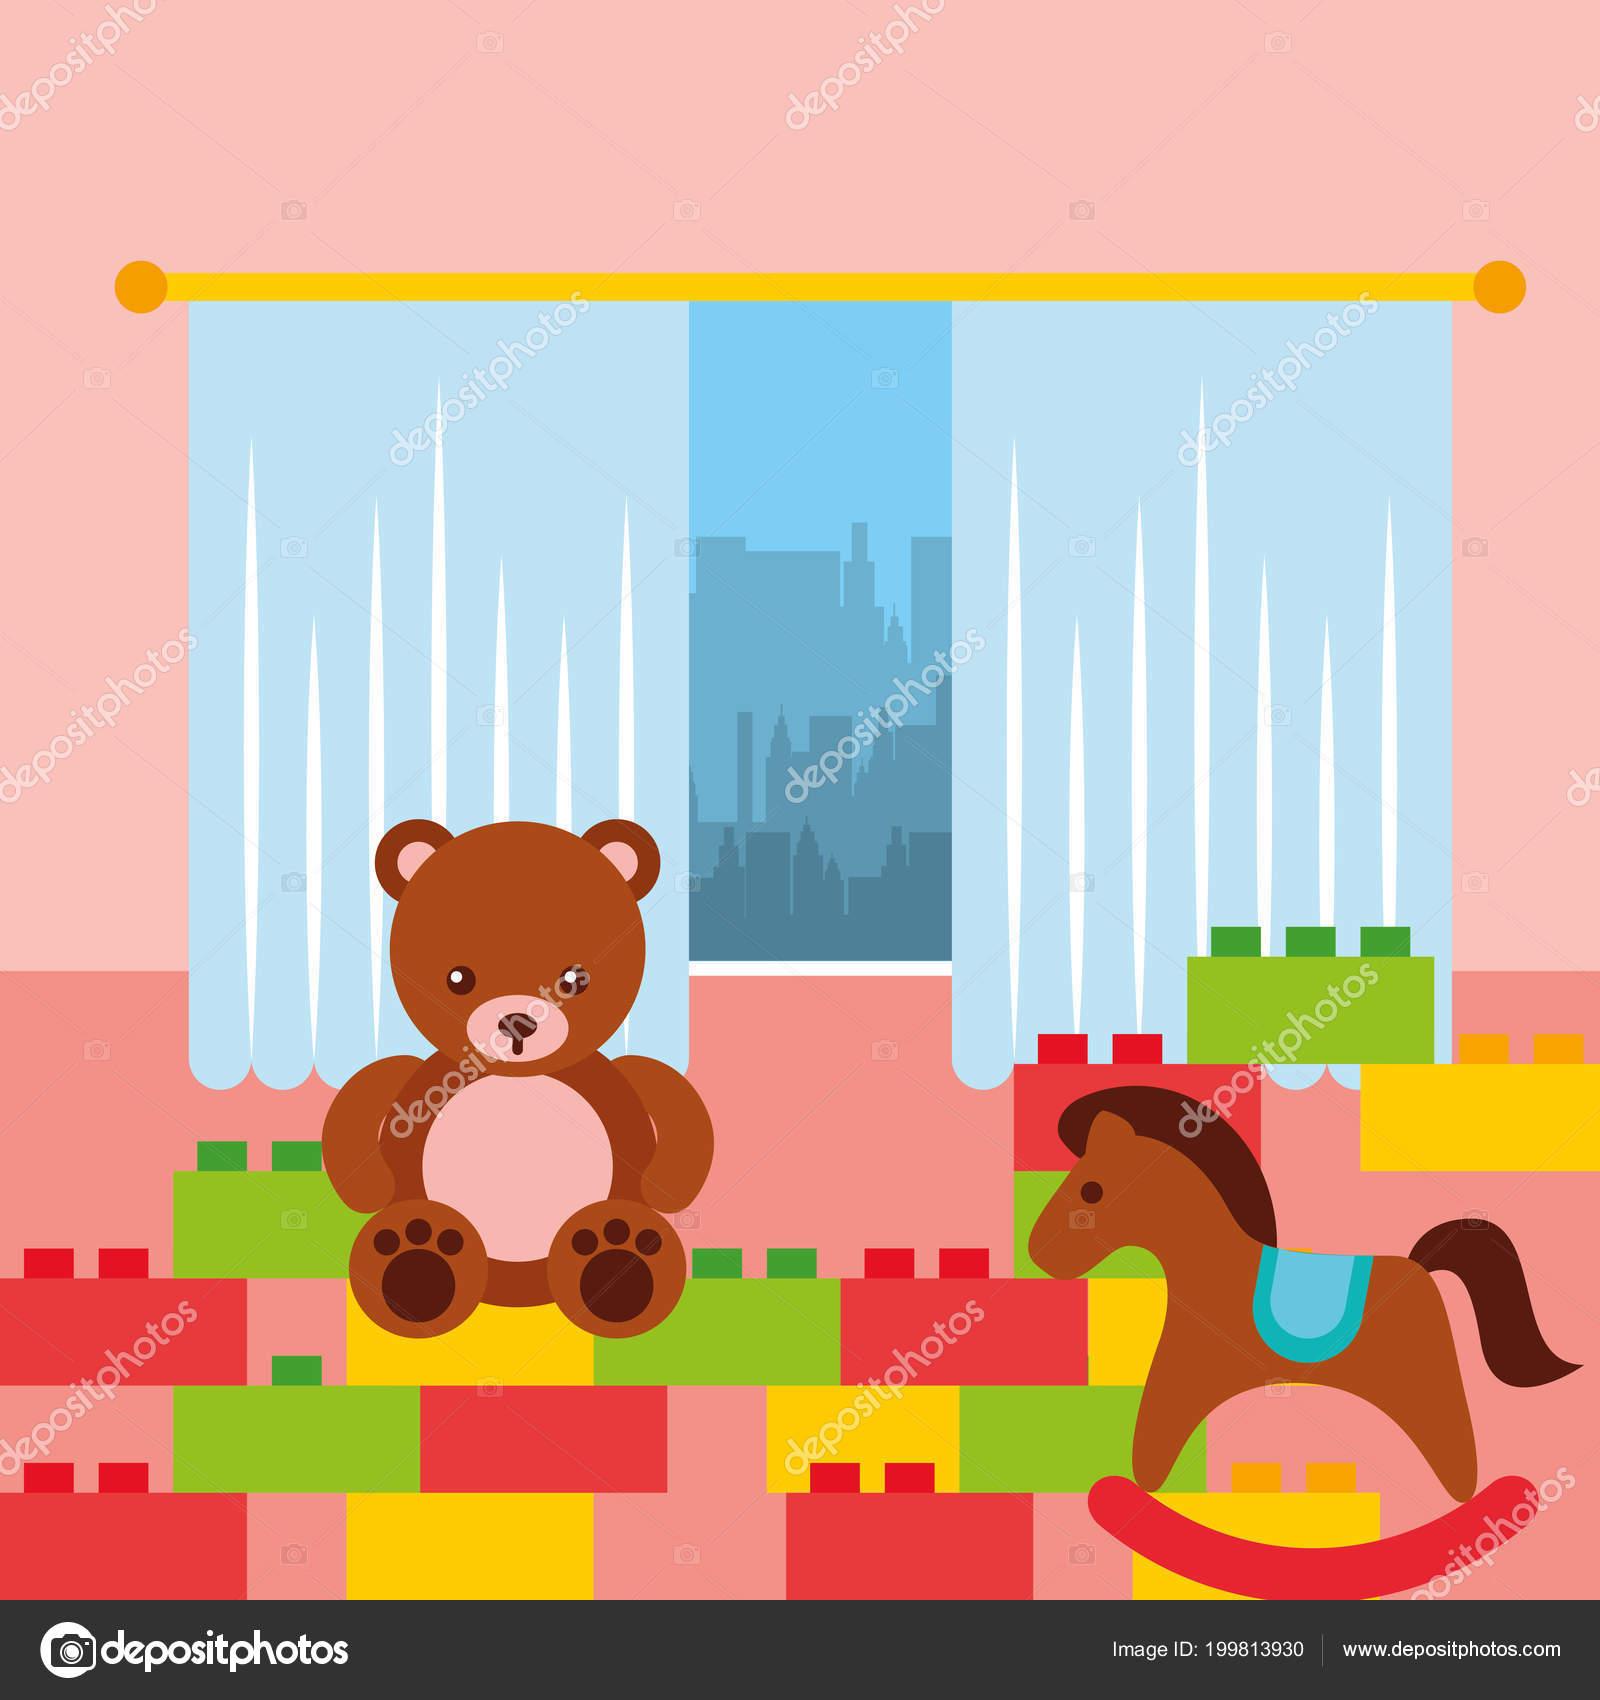 Classroom Kinder Bear Rocking Horse And Bricks Construction Toys Stock Vector C Yupiramos 199813930